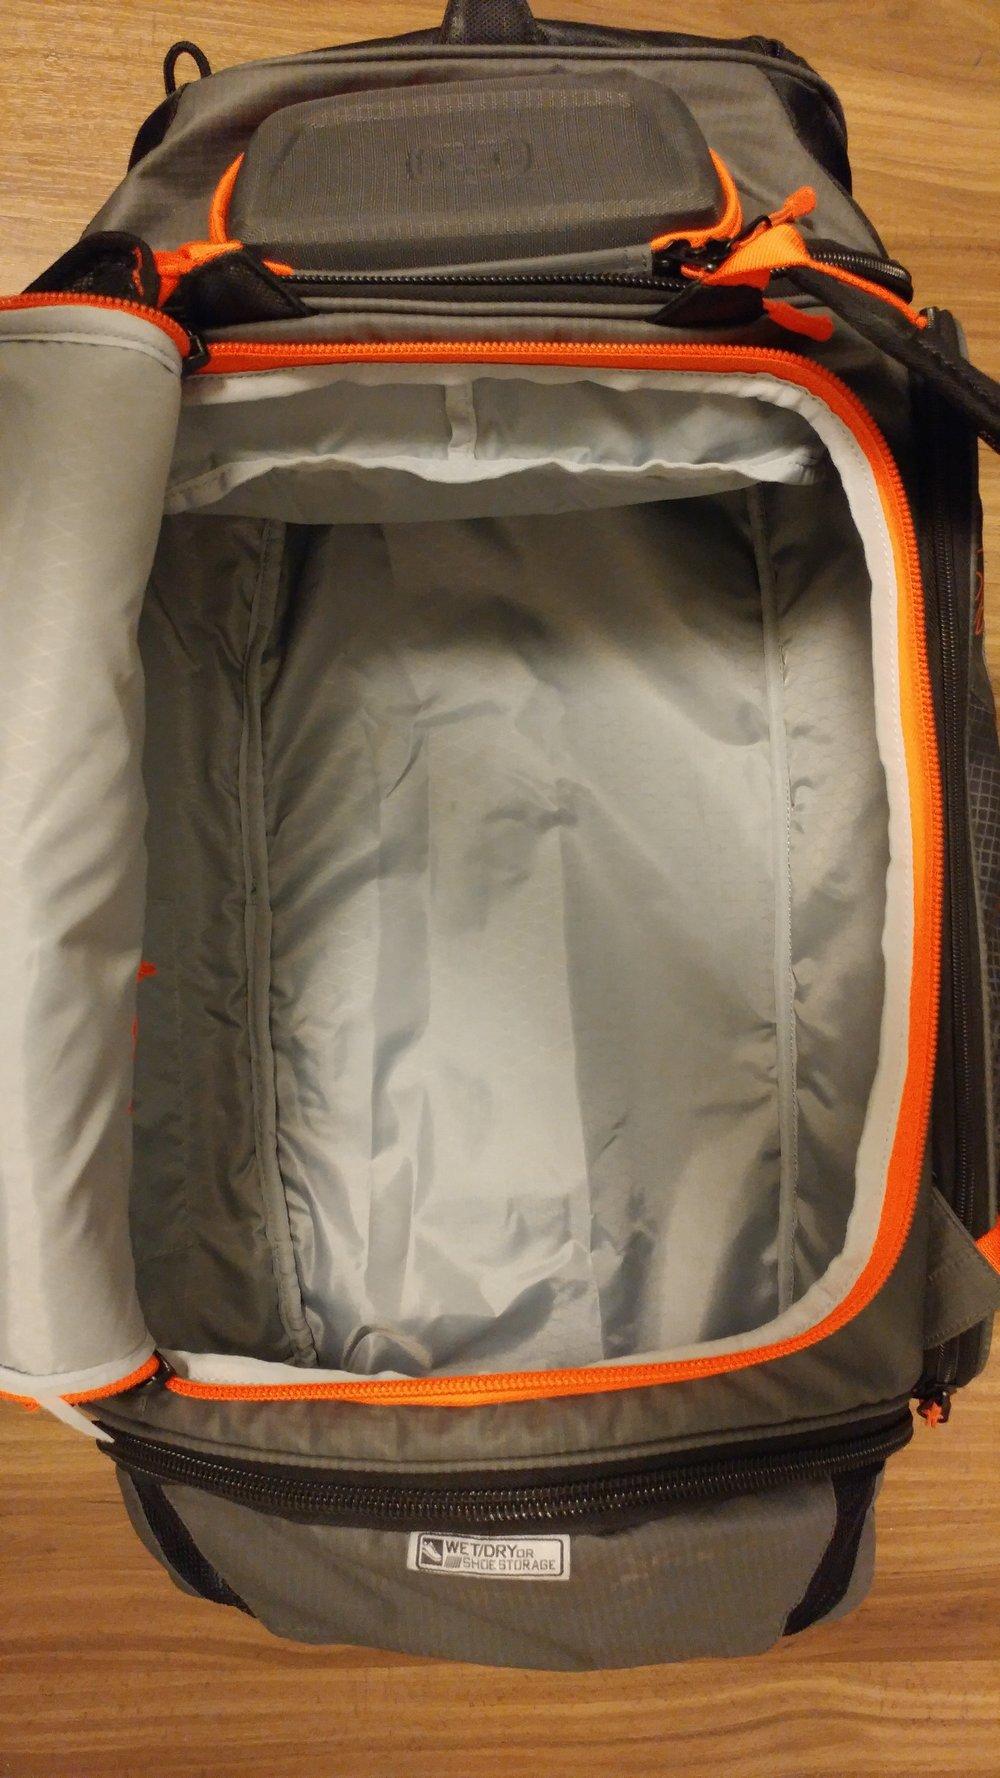 d60d985fece The Traveling Triathlete  Ogio 9.0 Athletic Bag Review — Team ...